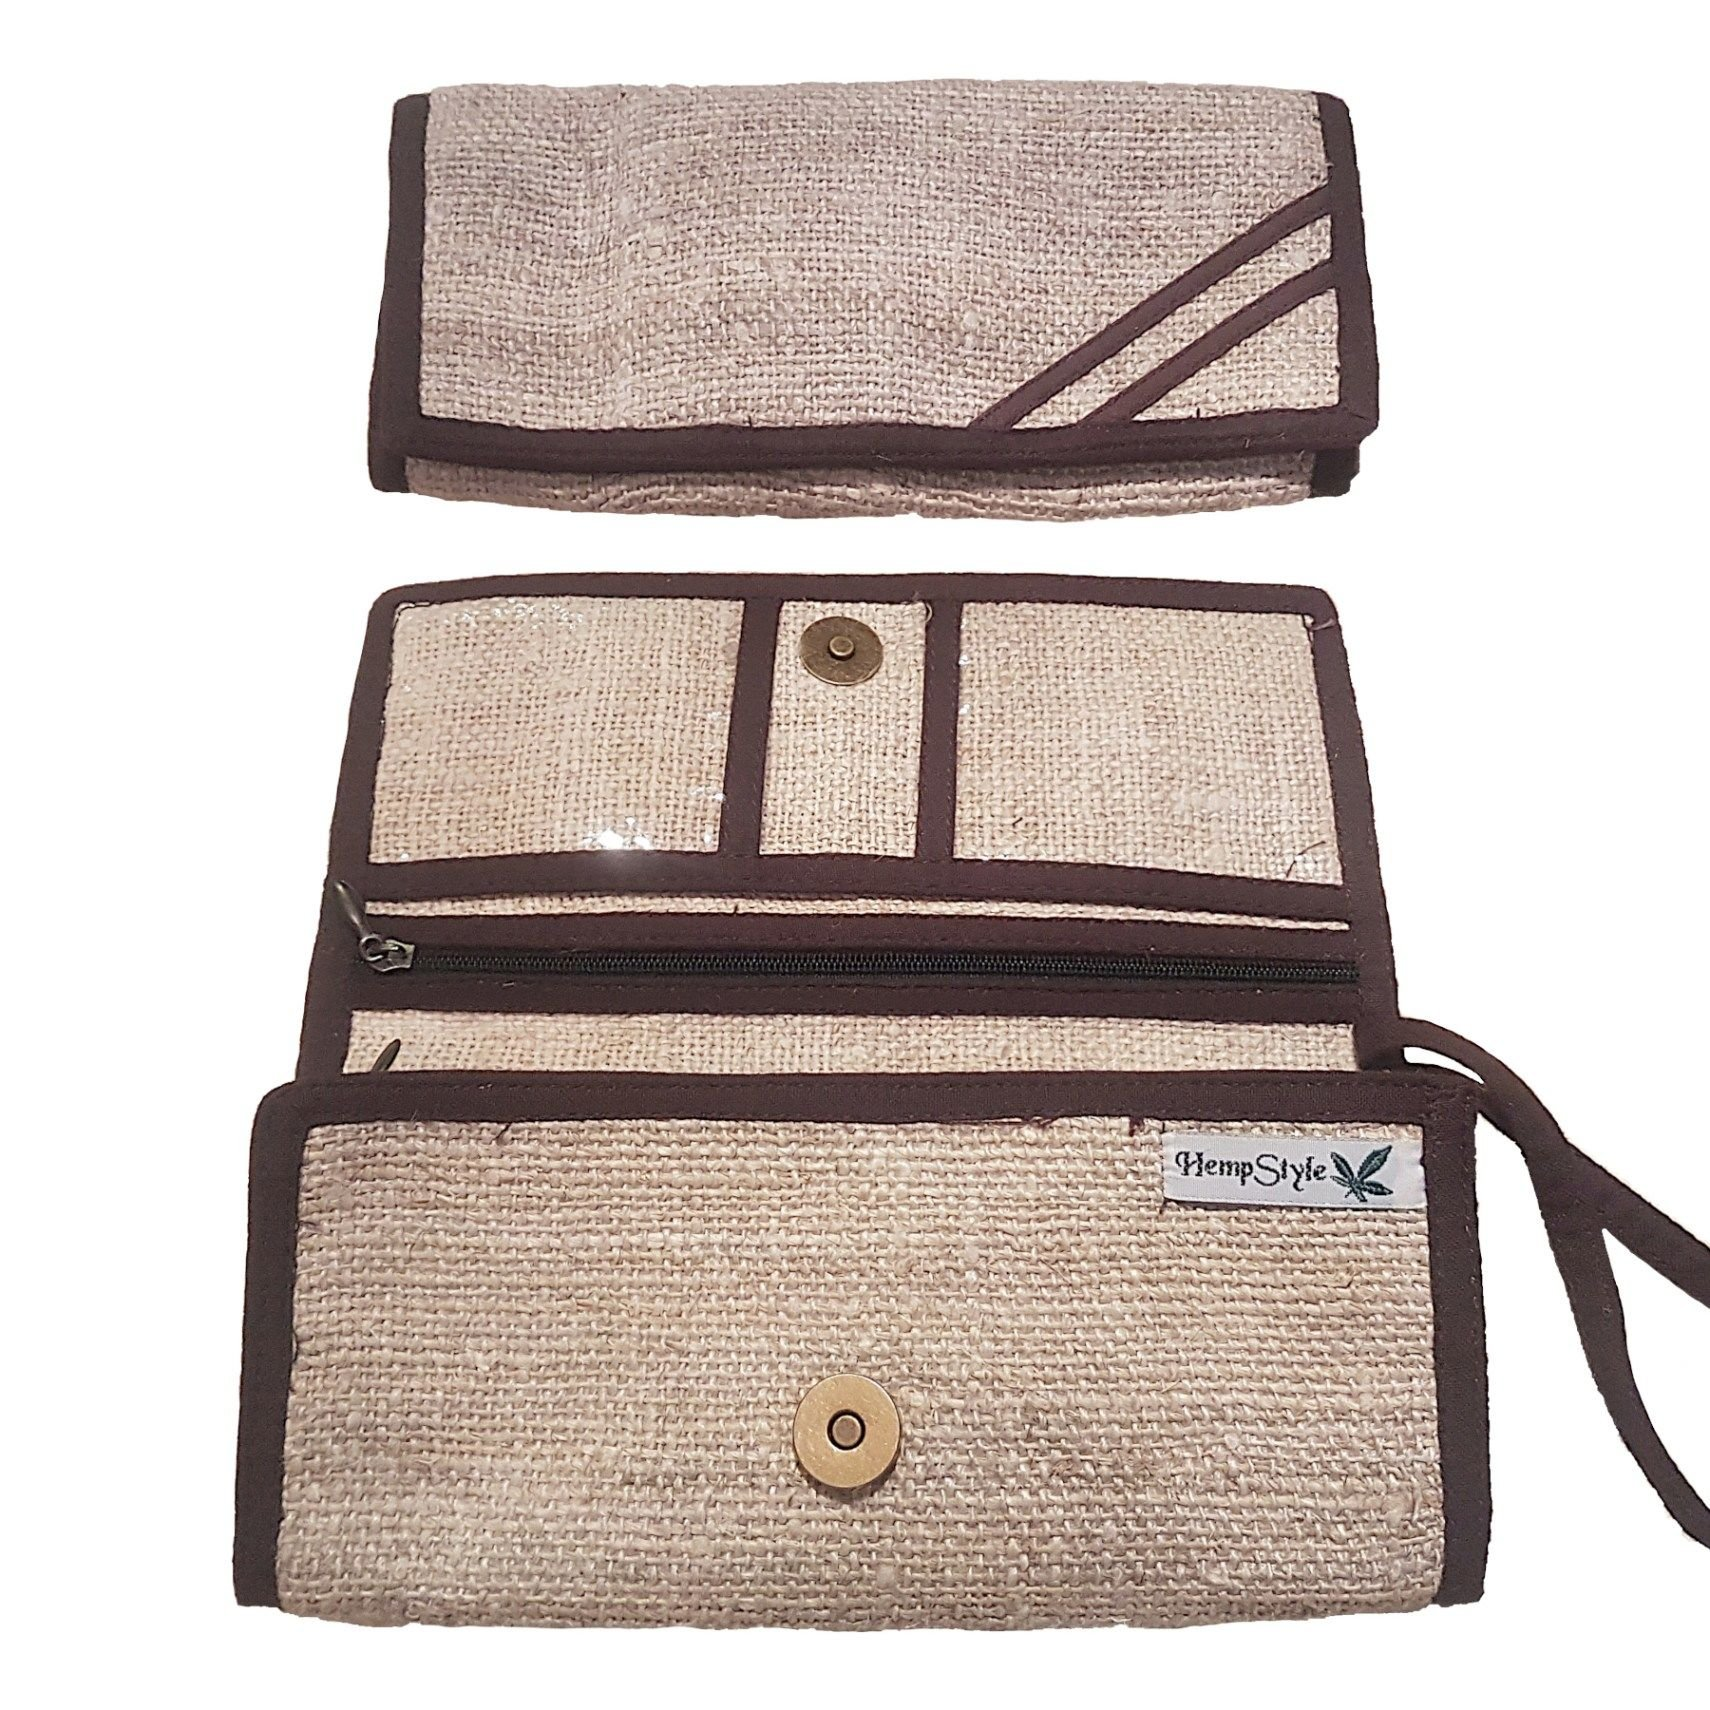 Hemp style natural purse